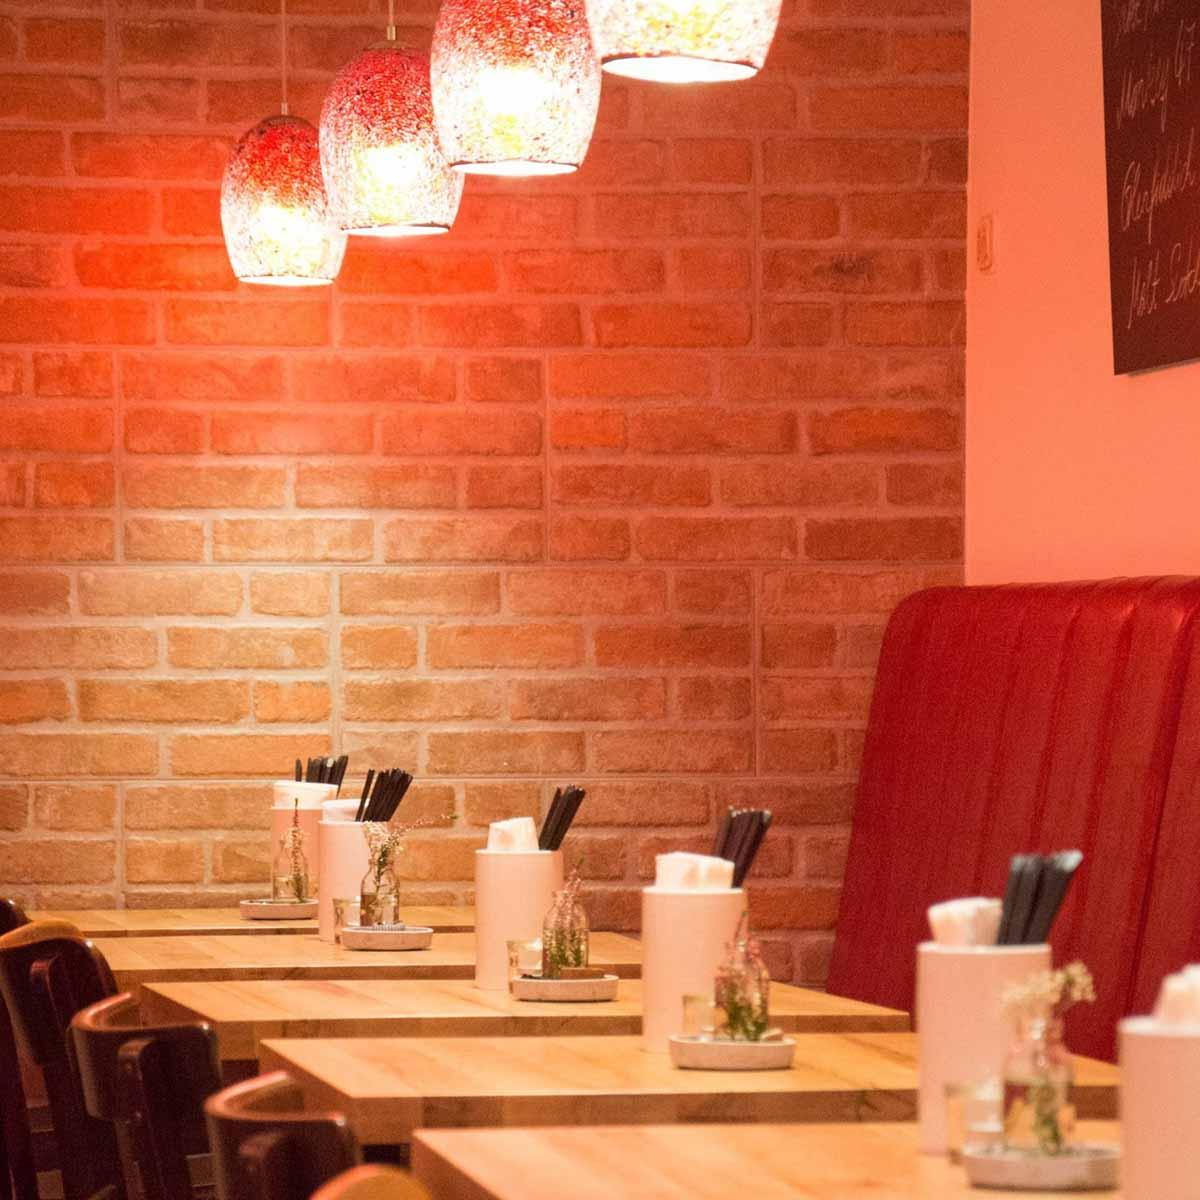 Restaurant Chili & Pfeffer in Wien-5